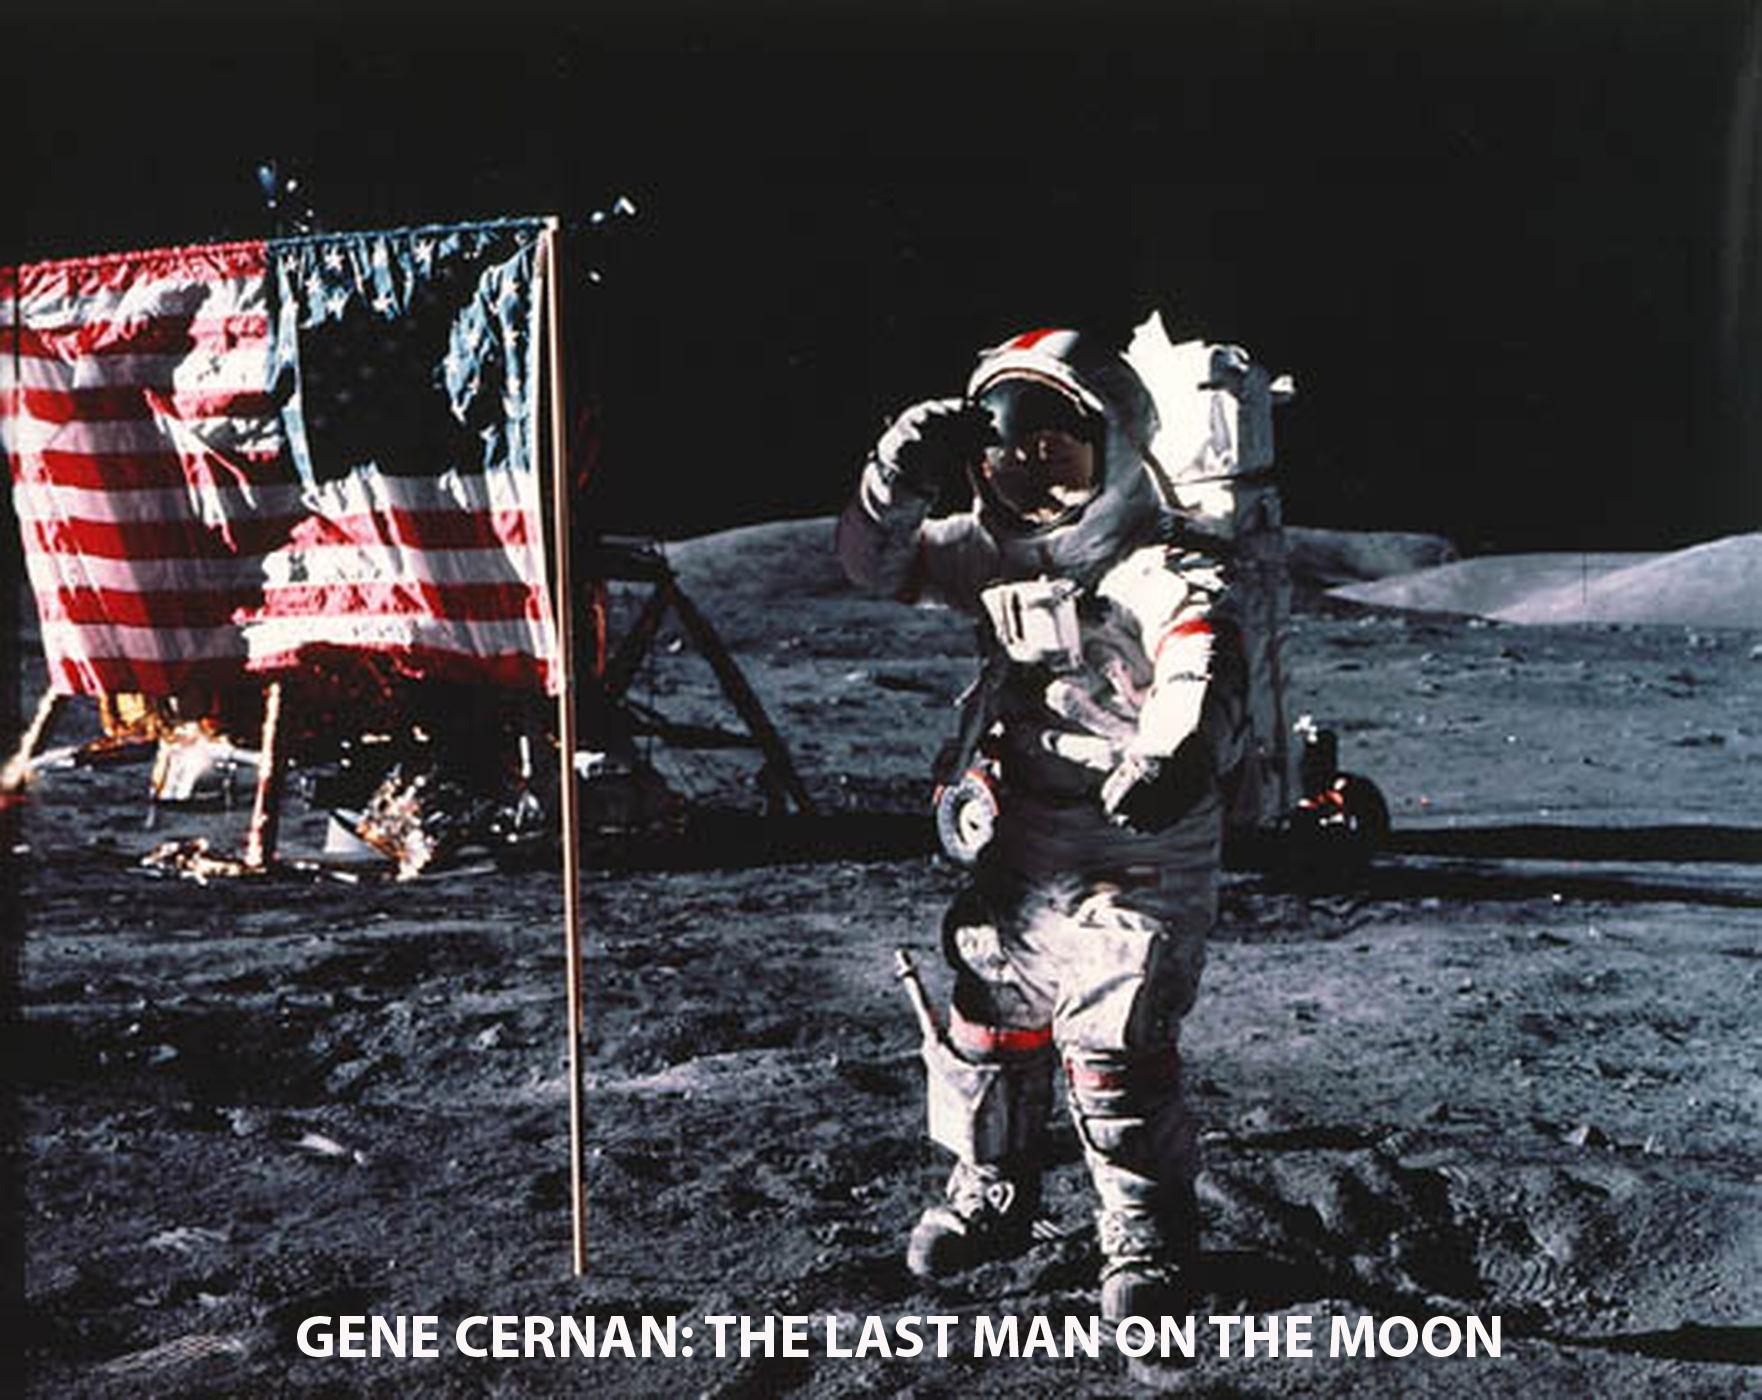 Fig. 3 - Gene Cernan on the Moon